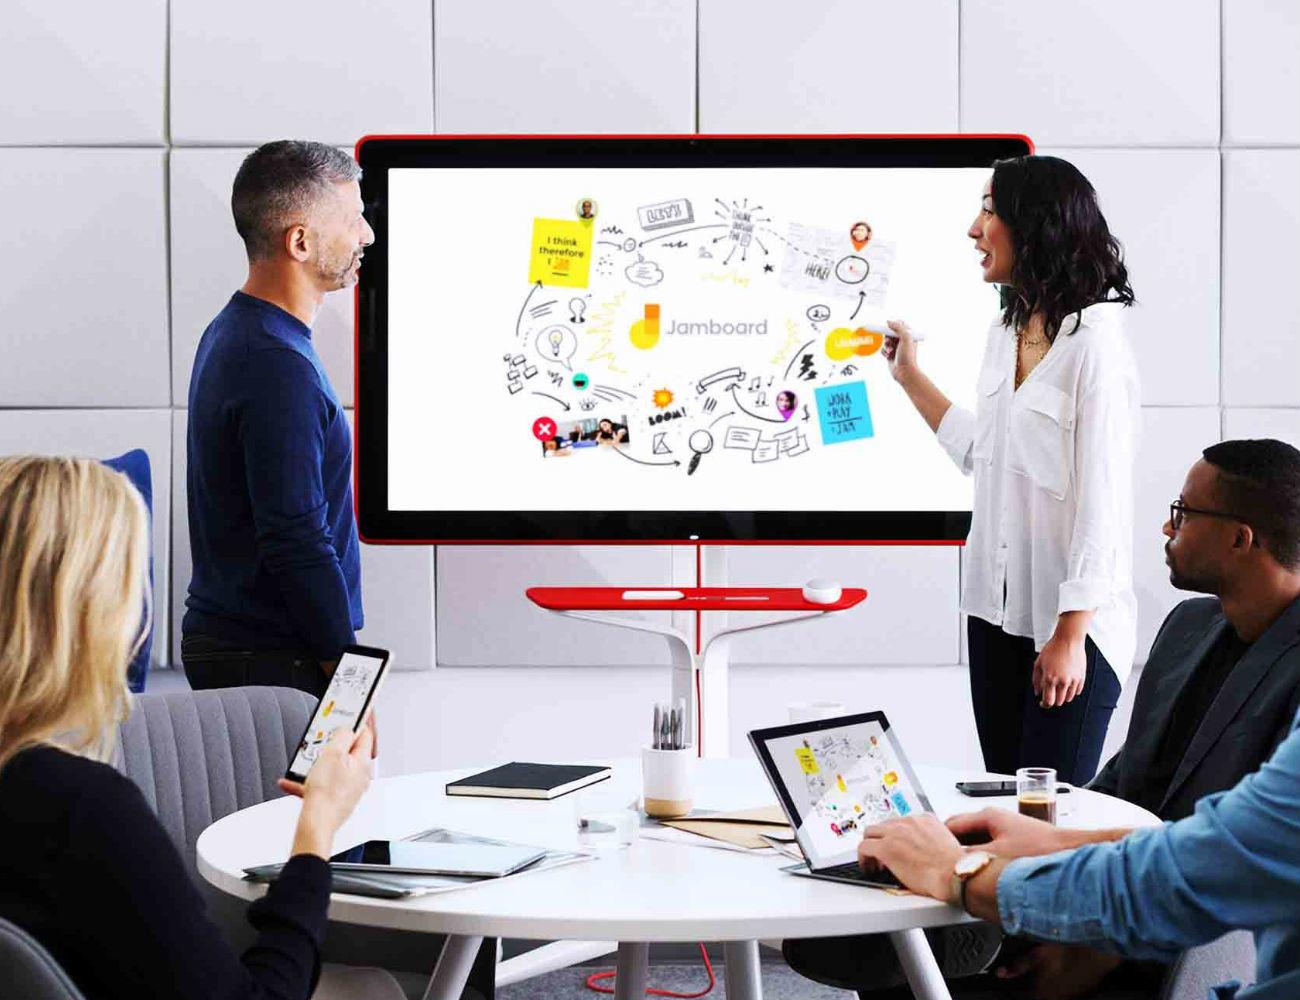 Google Jamboard – Smart Collaboration Space